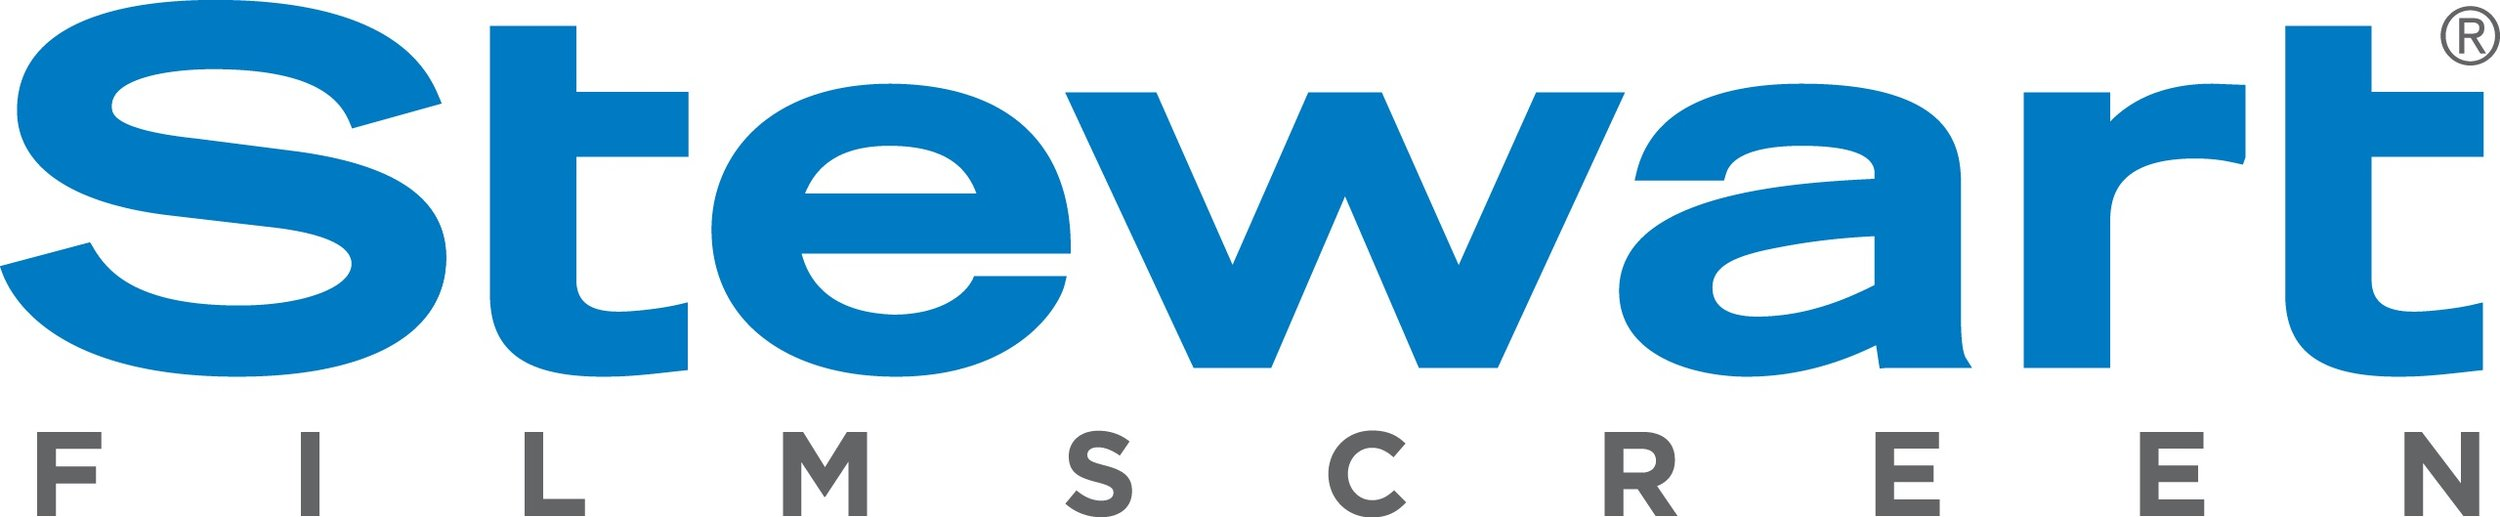 blog_stewart_logo_2015.jpg